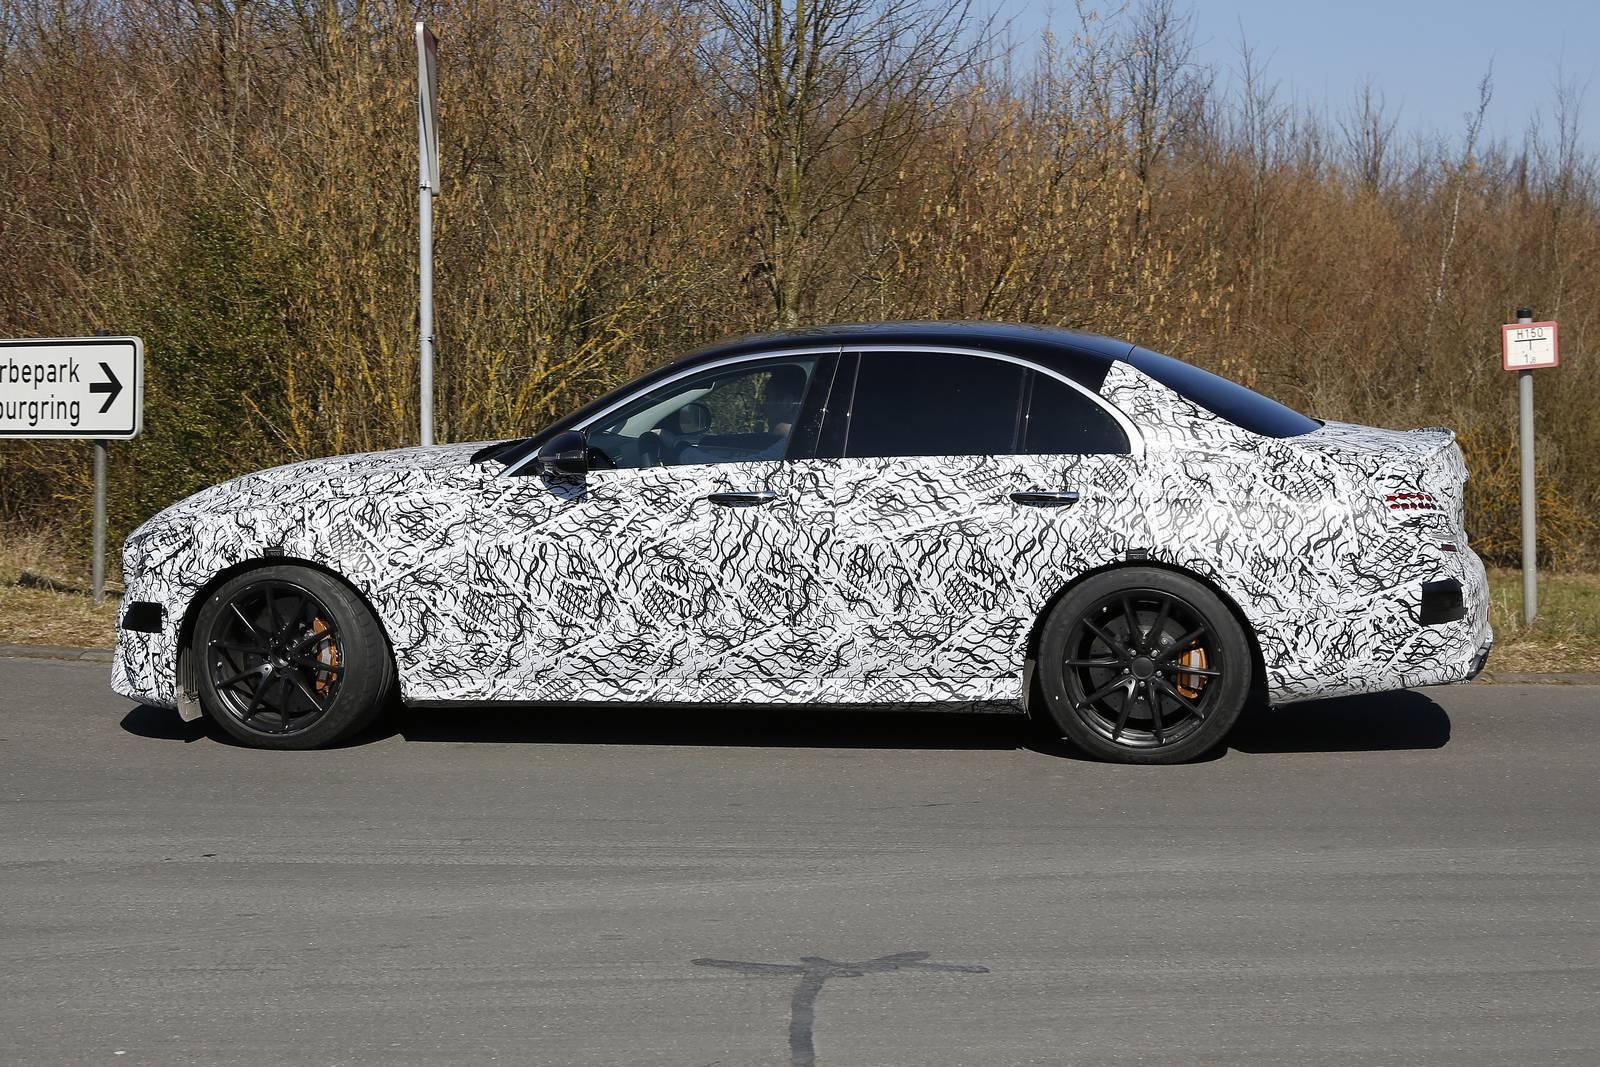 Latest Spy Shots Of 2018 Mercedes Amg E63 Sedan And Estate Emerge